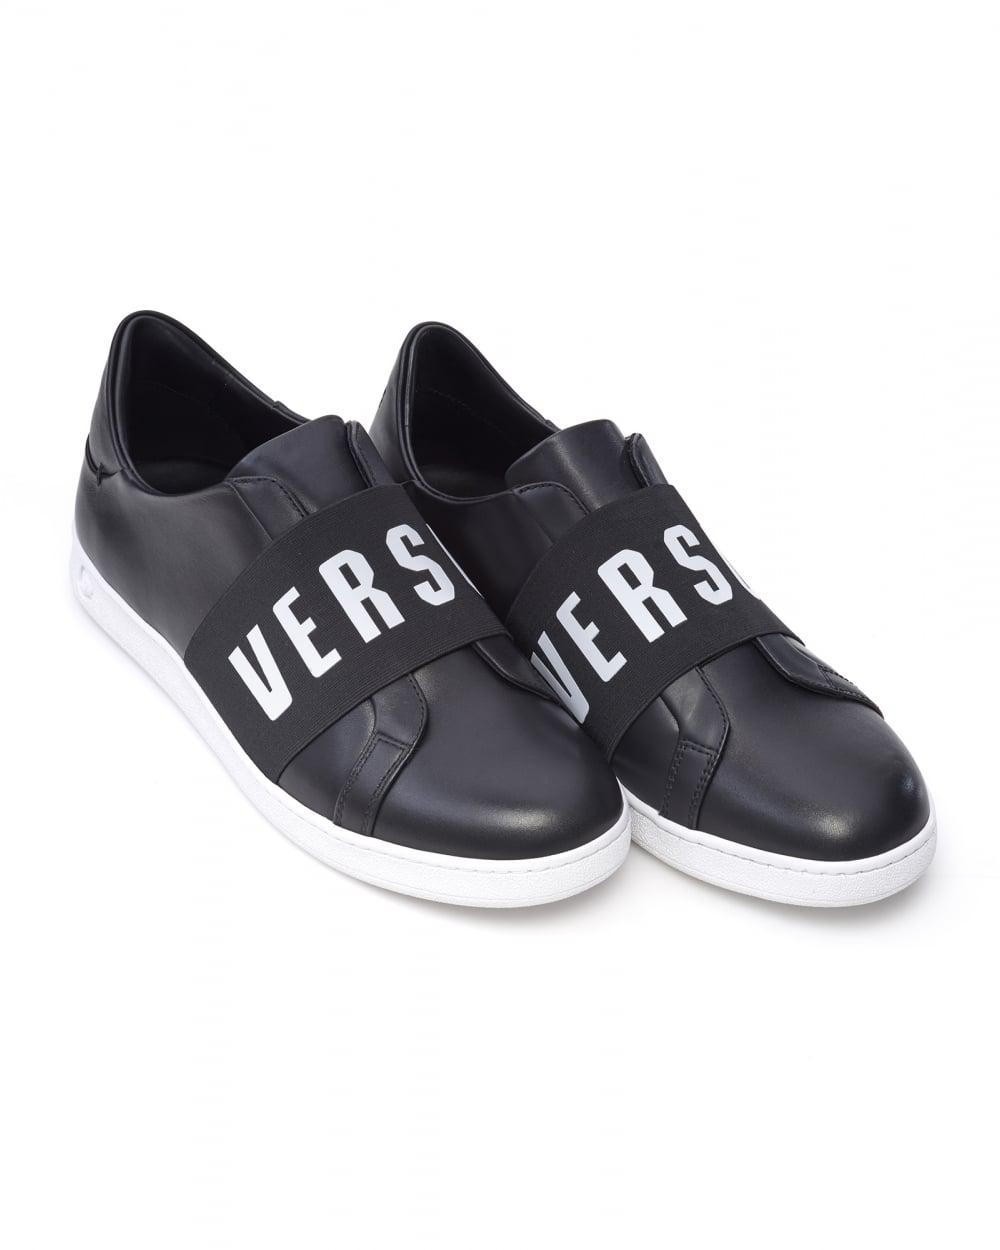 Adc Uk Shoes